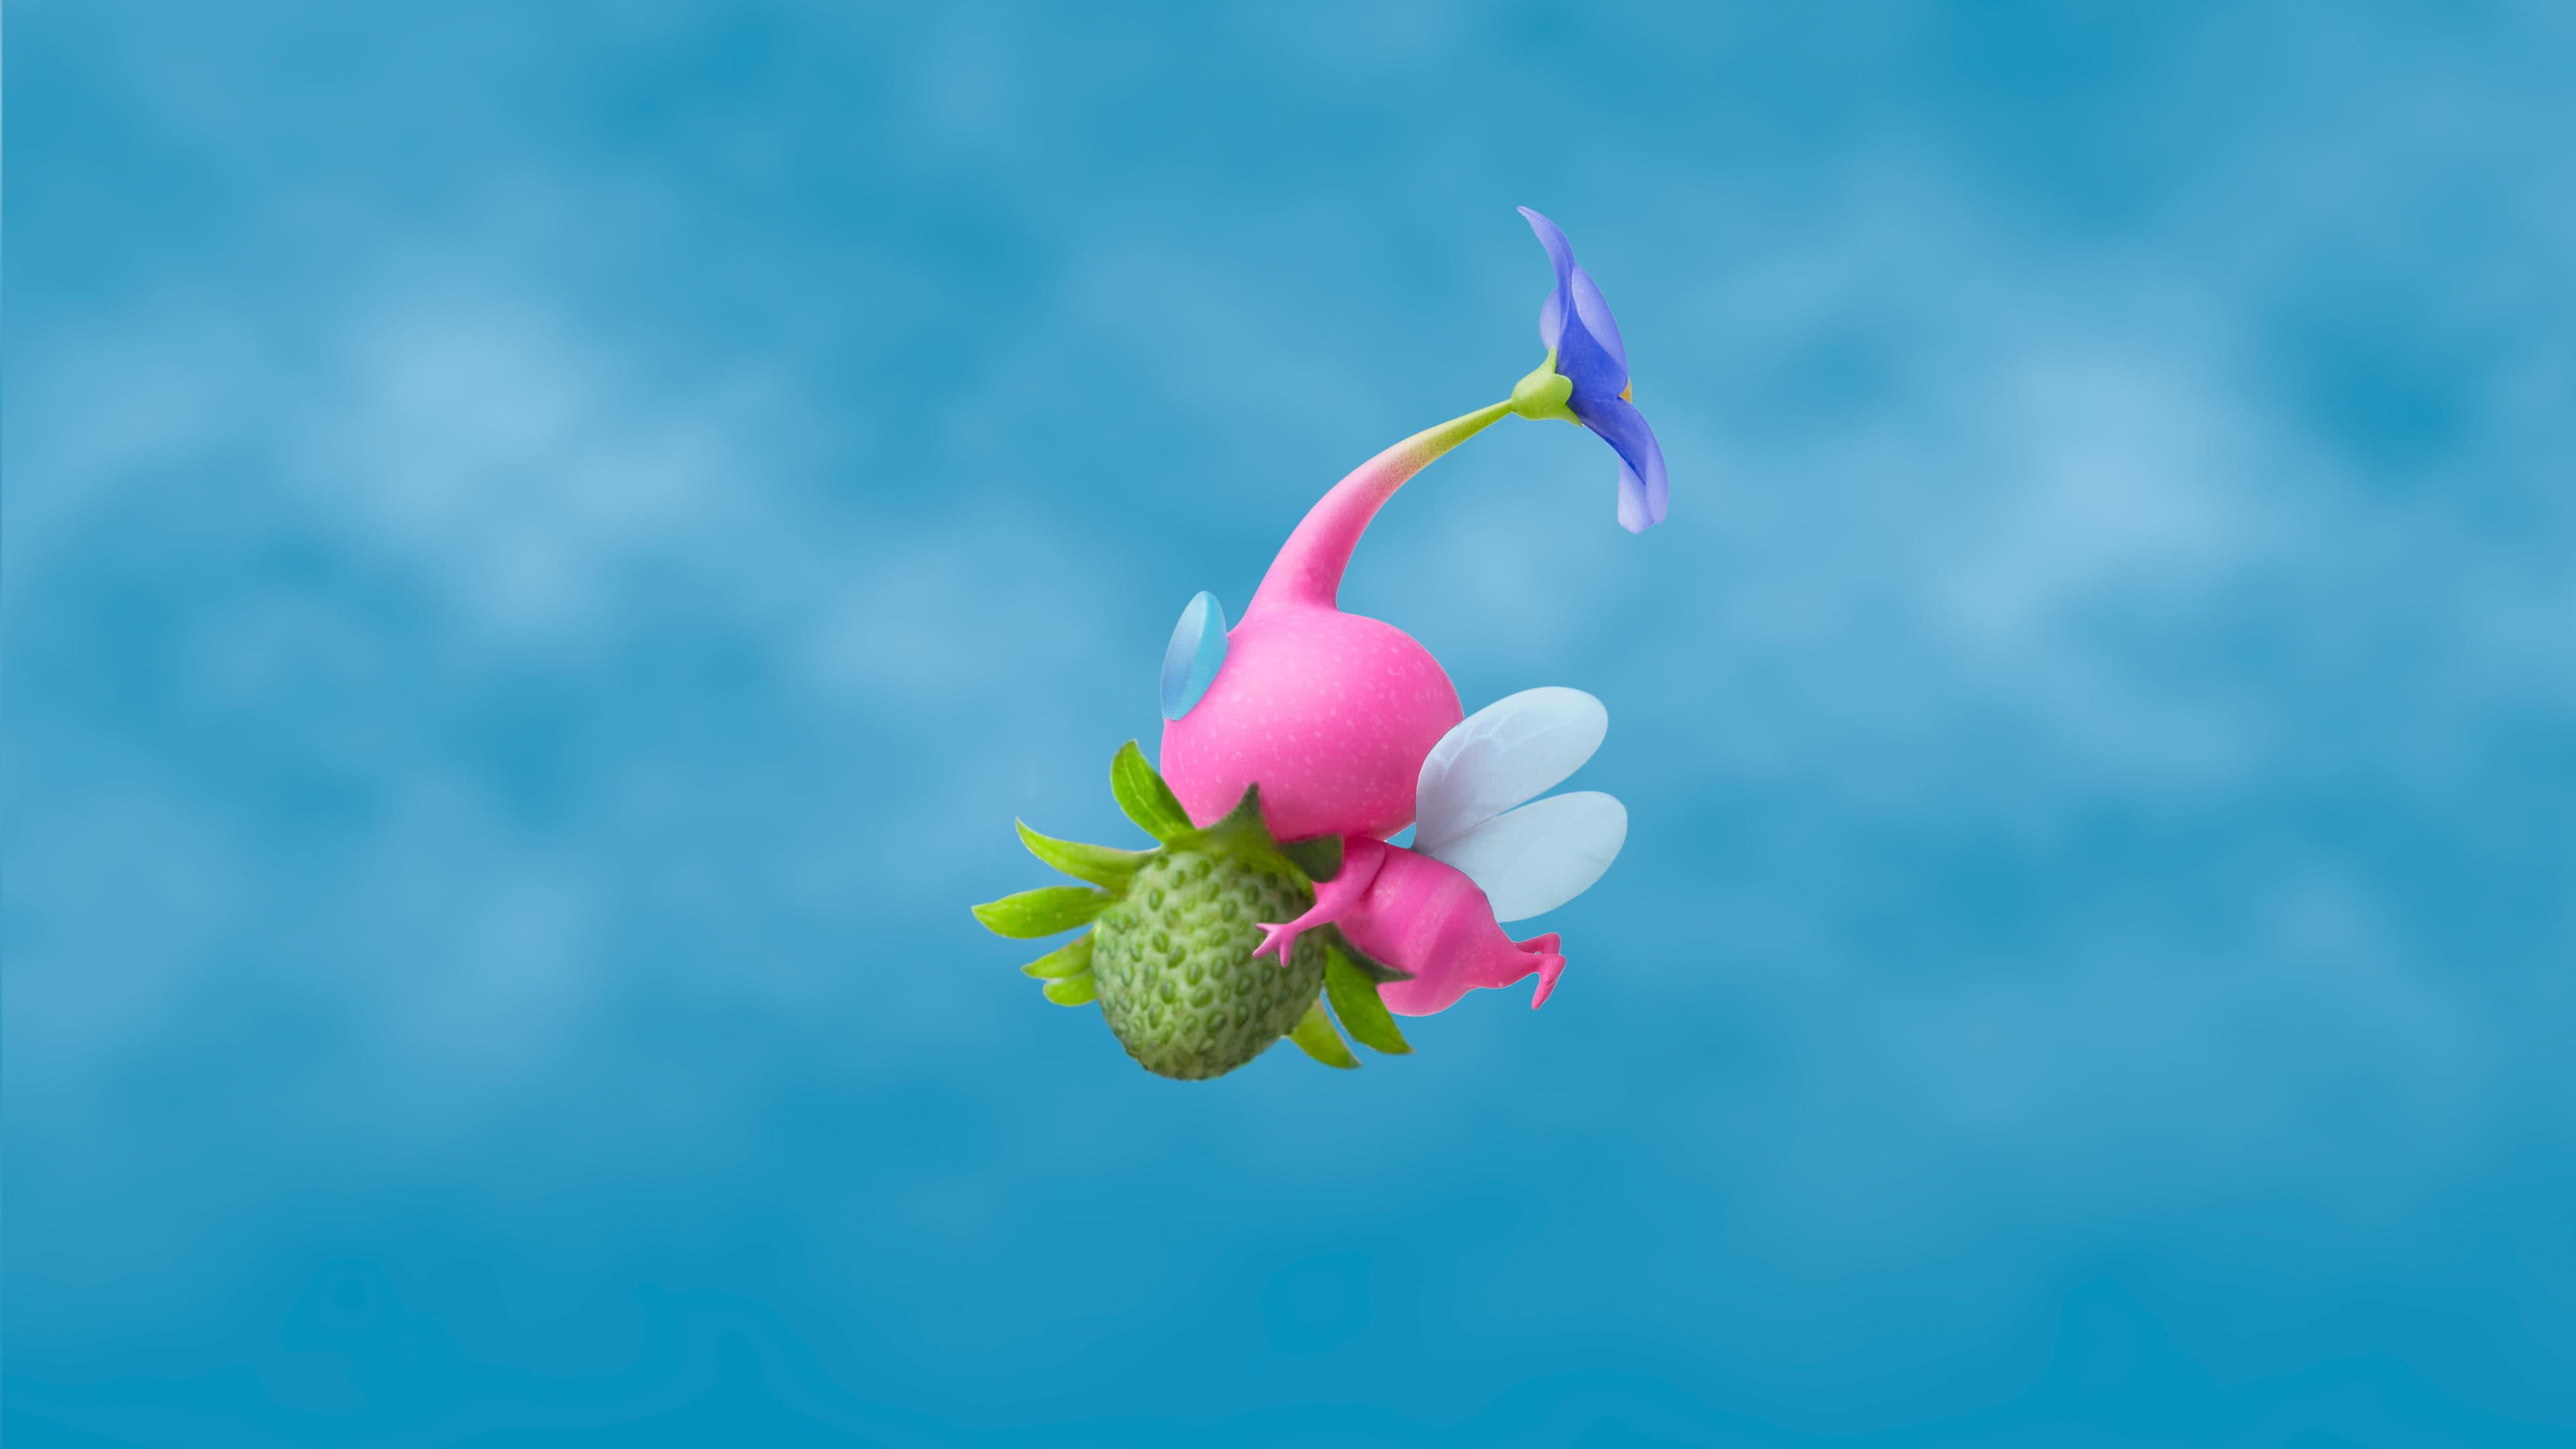 Hey Pikmin Winged UHD 4K Wallpaper Pixelz 3840x2160